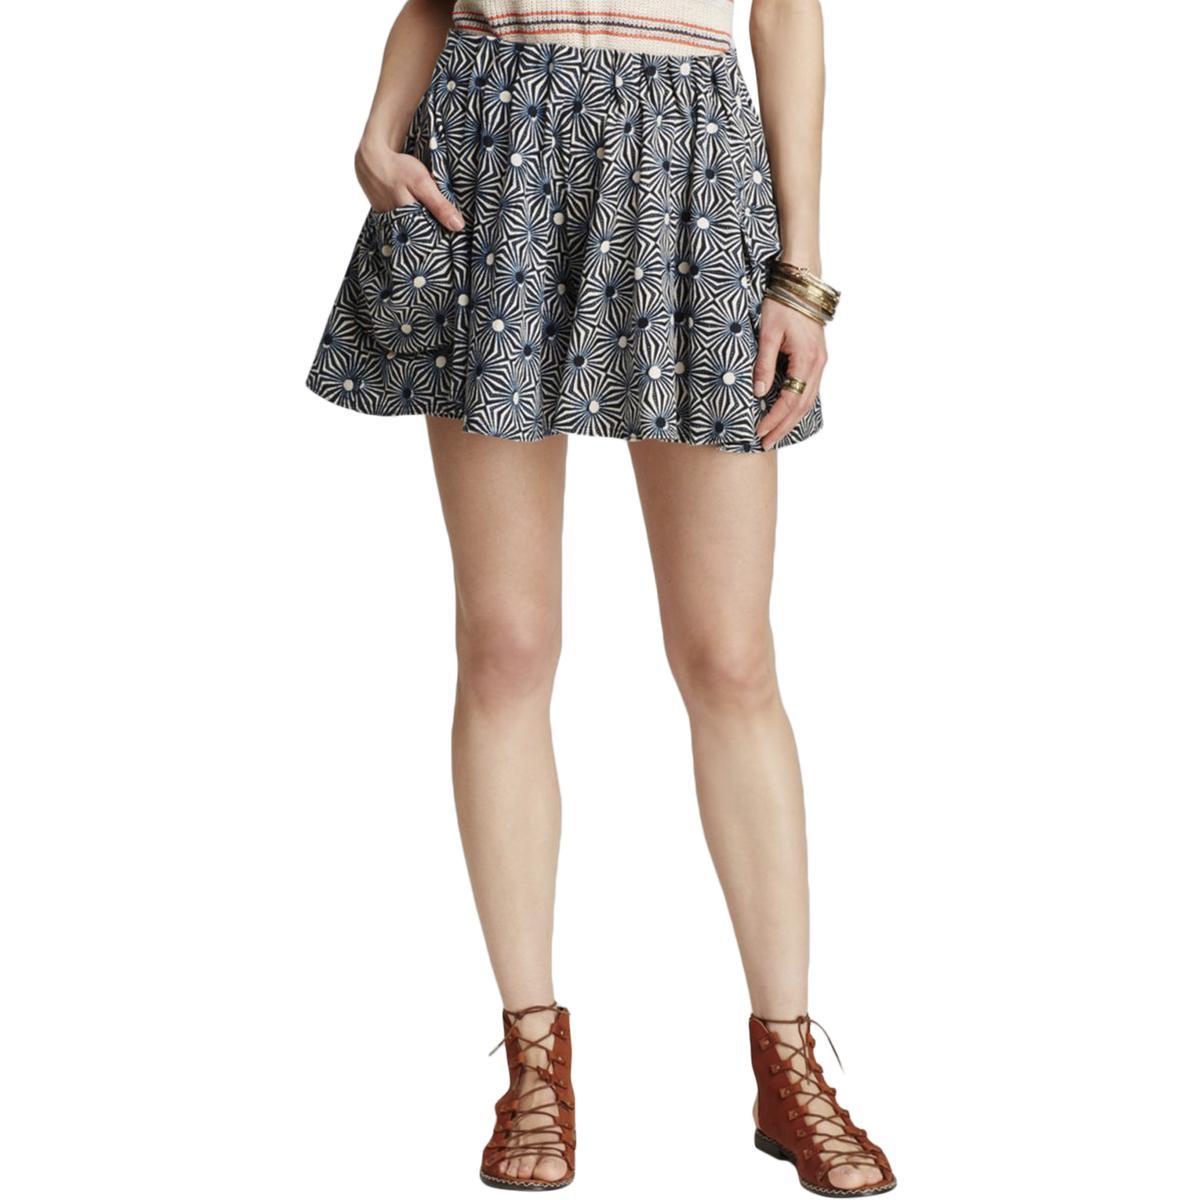 free 3008 womens pattern above knee a line skirt bhfo